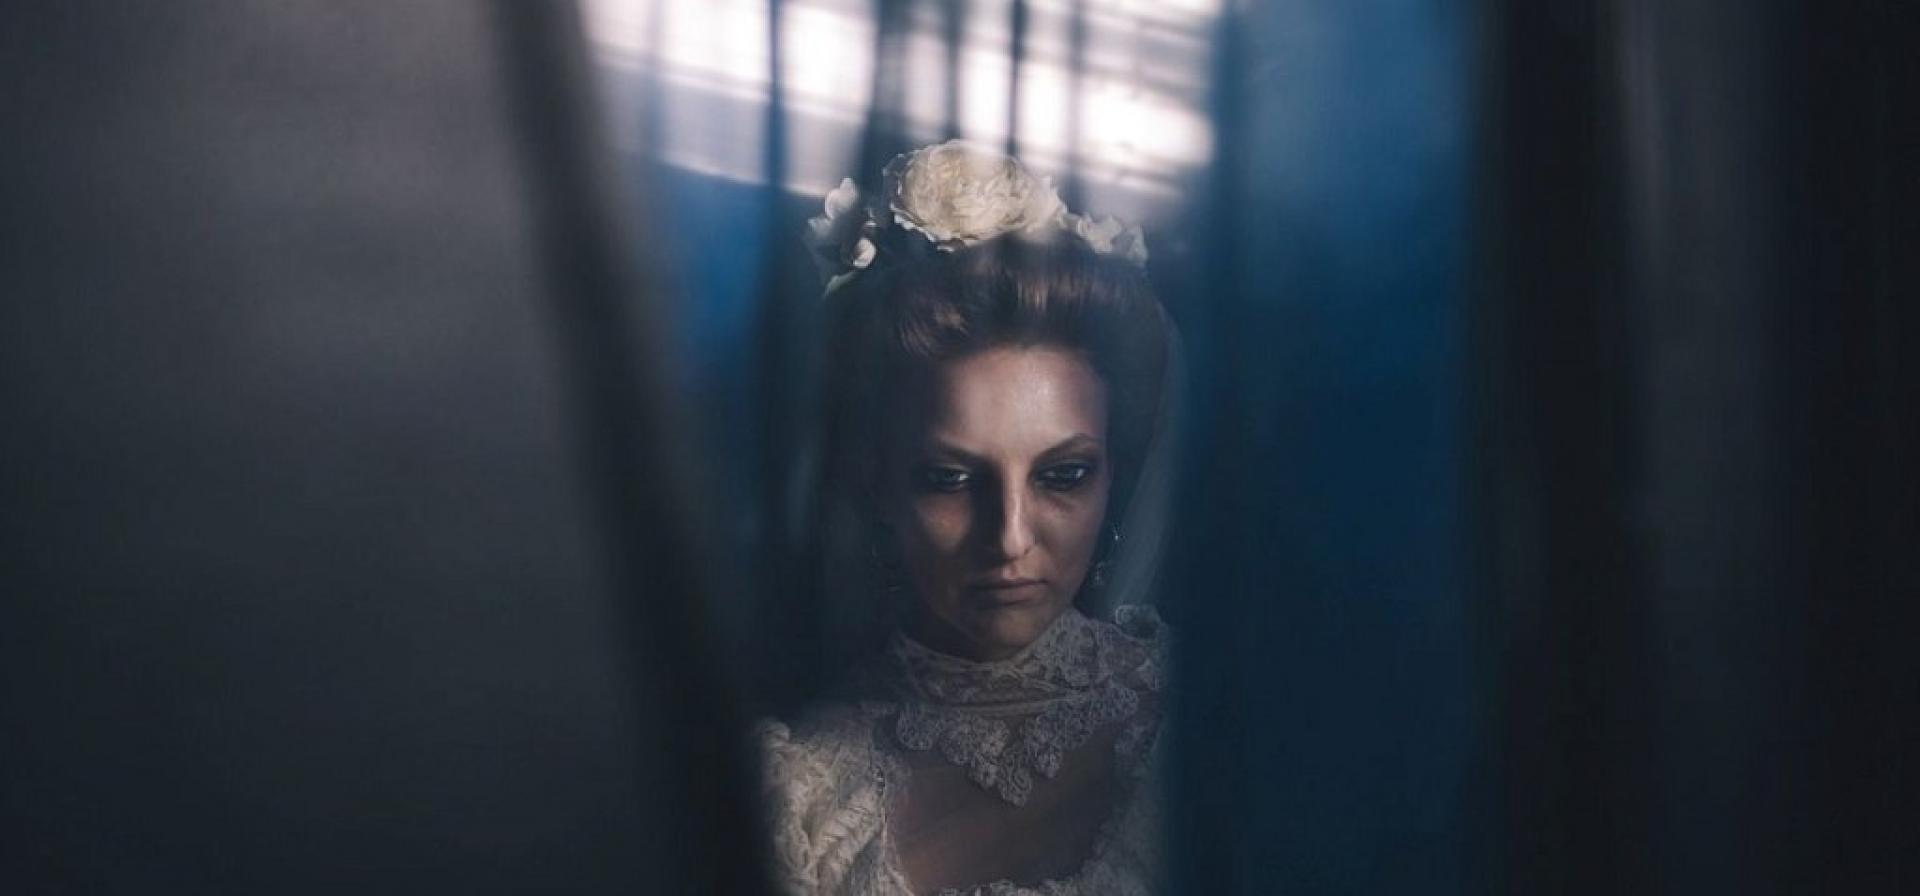 Nevesta - The Bride (2017)